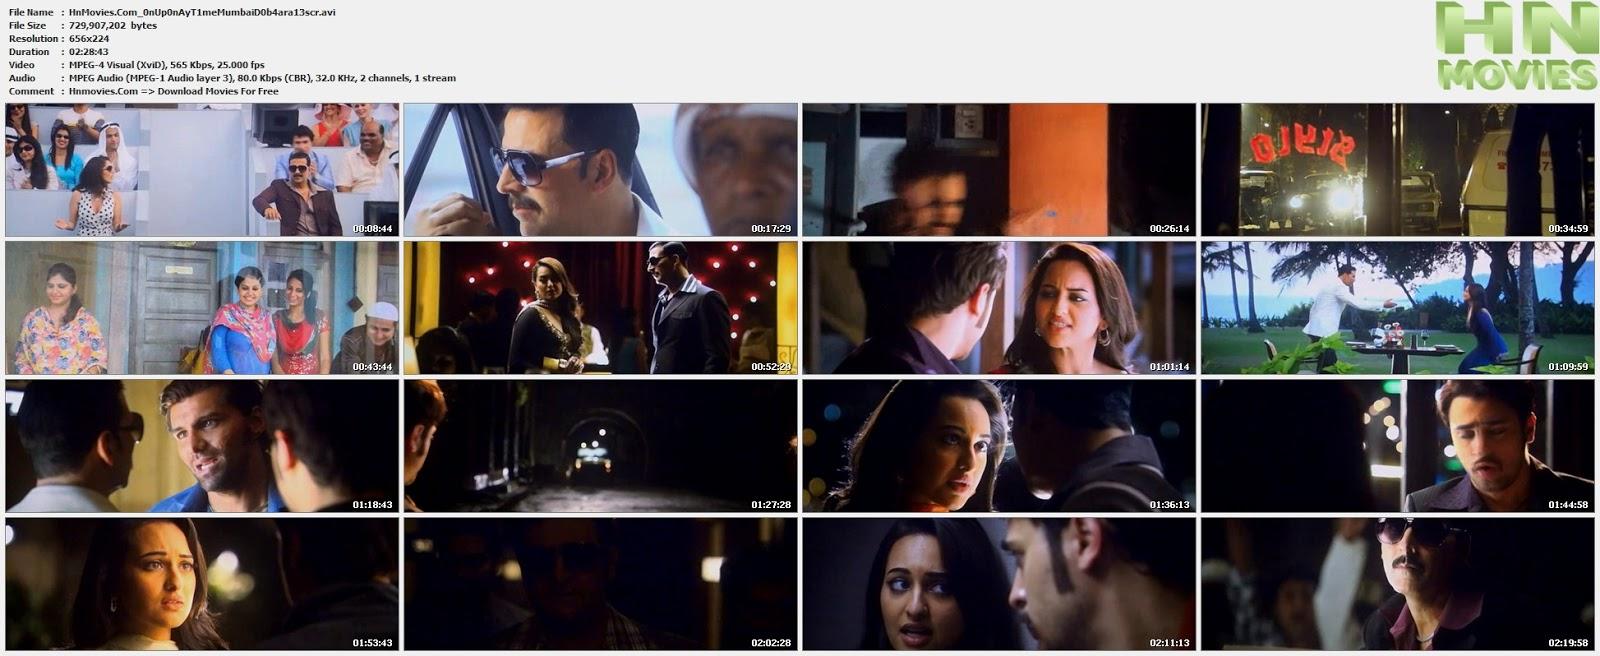 movie screenshot of Once Upon Ay Time in Mumbai Dobaara fdmovie.com